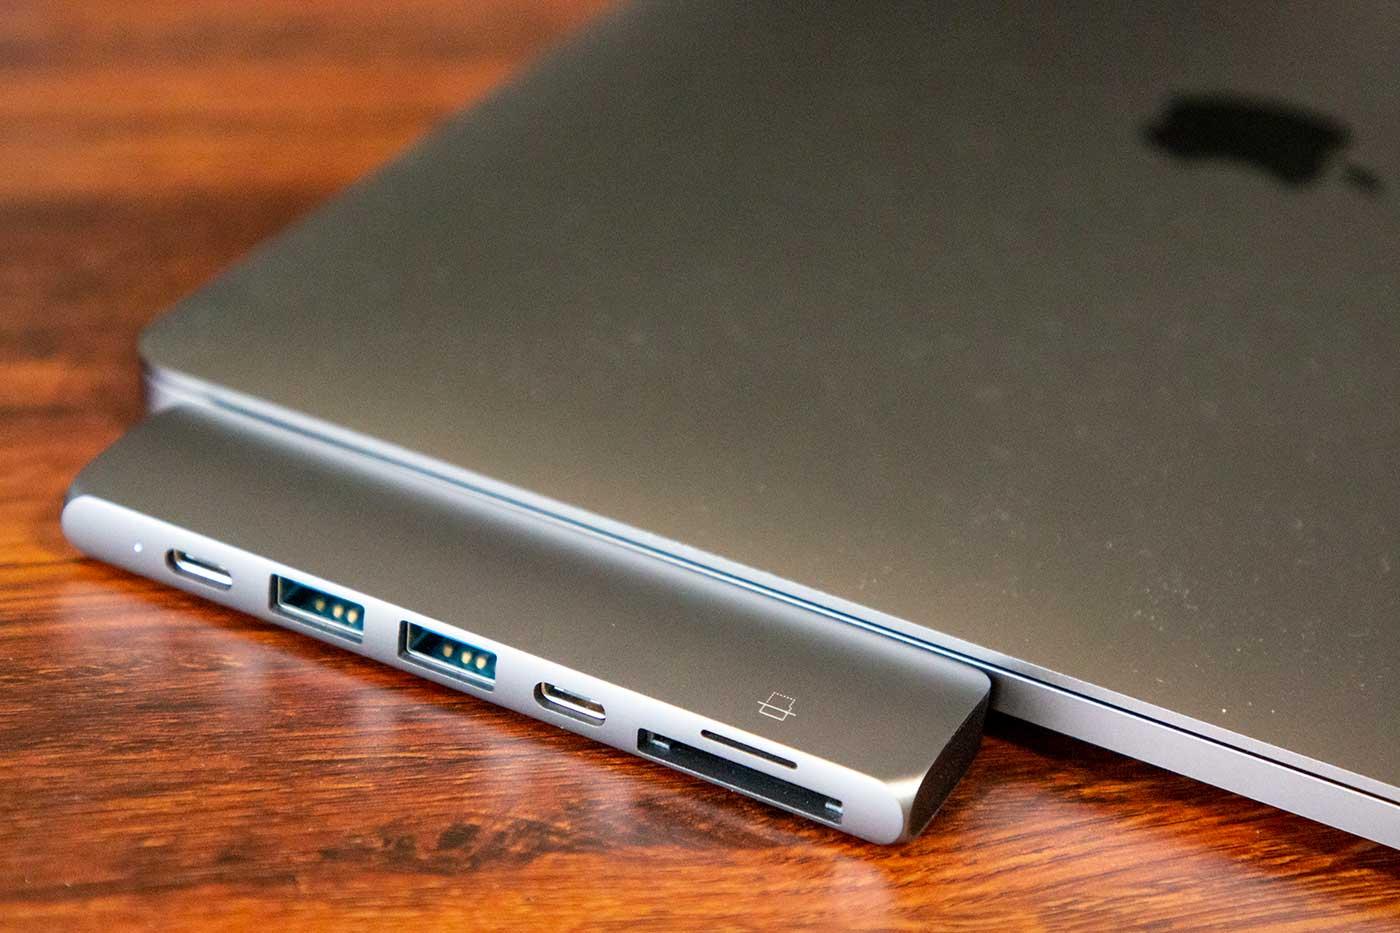 MacBookProのディスプレイを閉じた状態